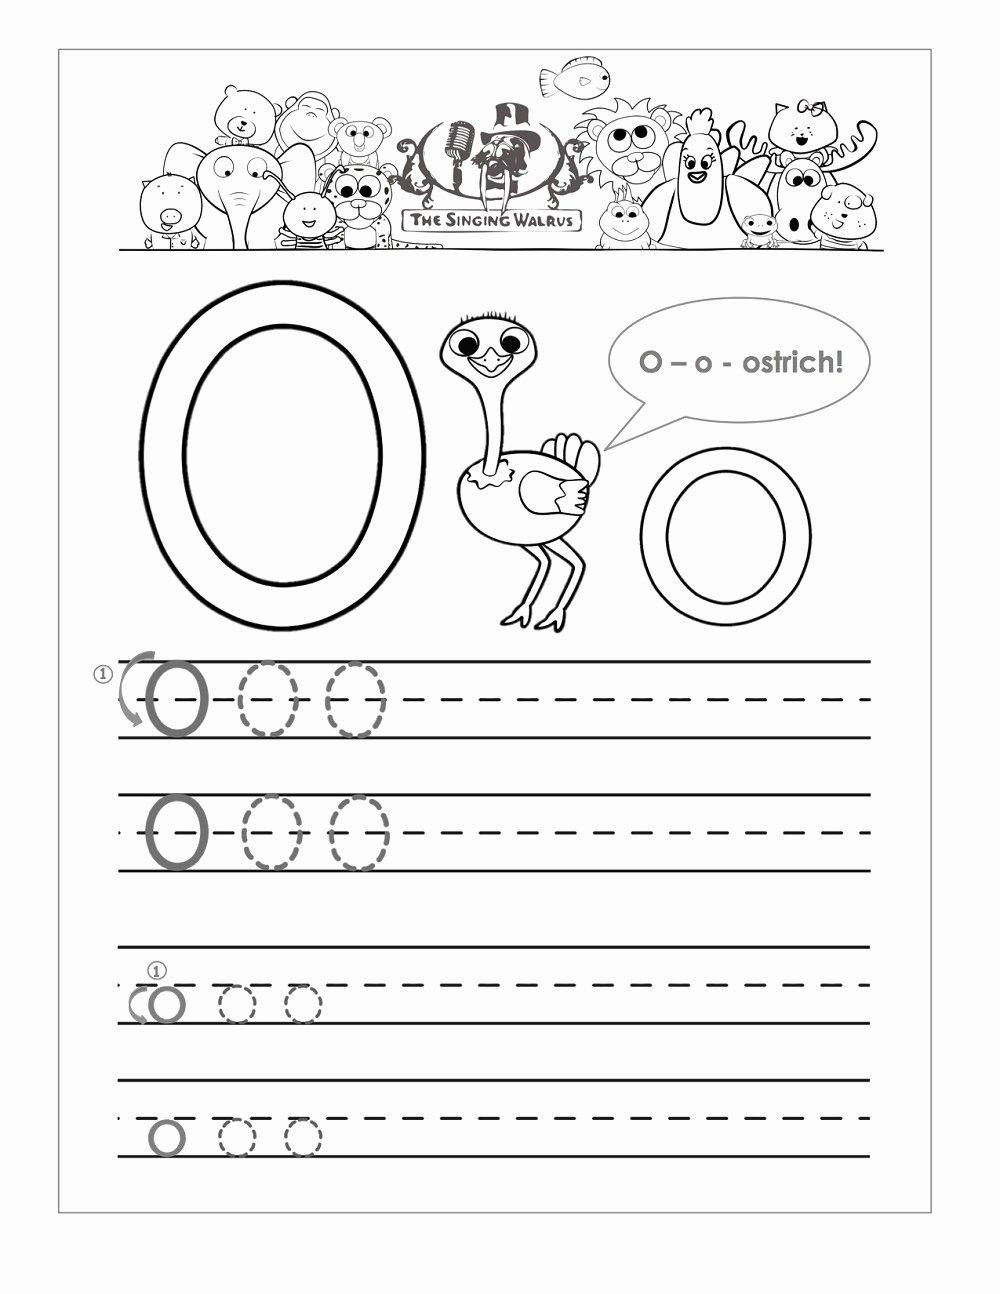 Letter O Worksheets for Preschoolers Ideas Worksheet the Letter Oorksheets for Kindergarten Object